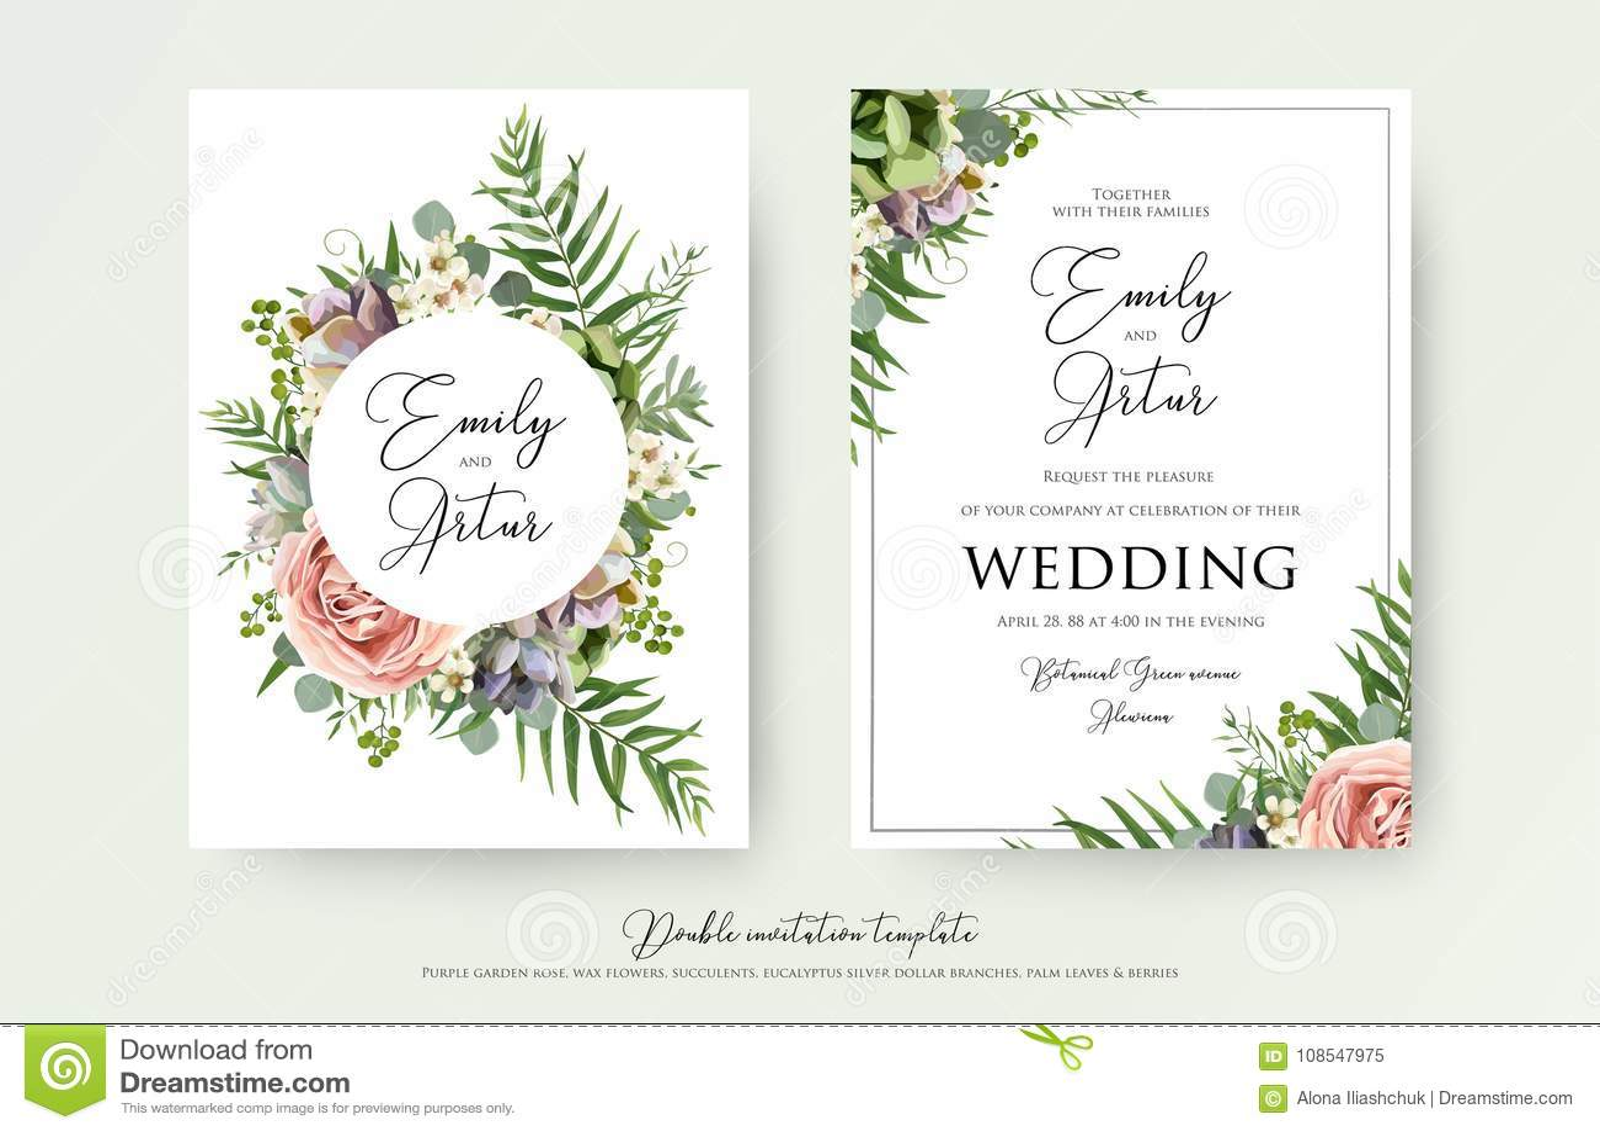 Floral Wedding Invitation Elegant Invite Thank You Rsvp Card V